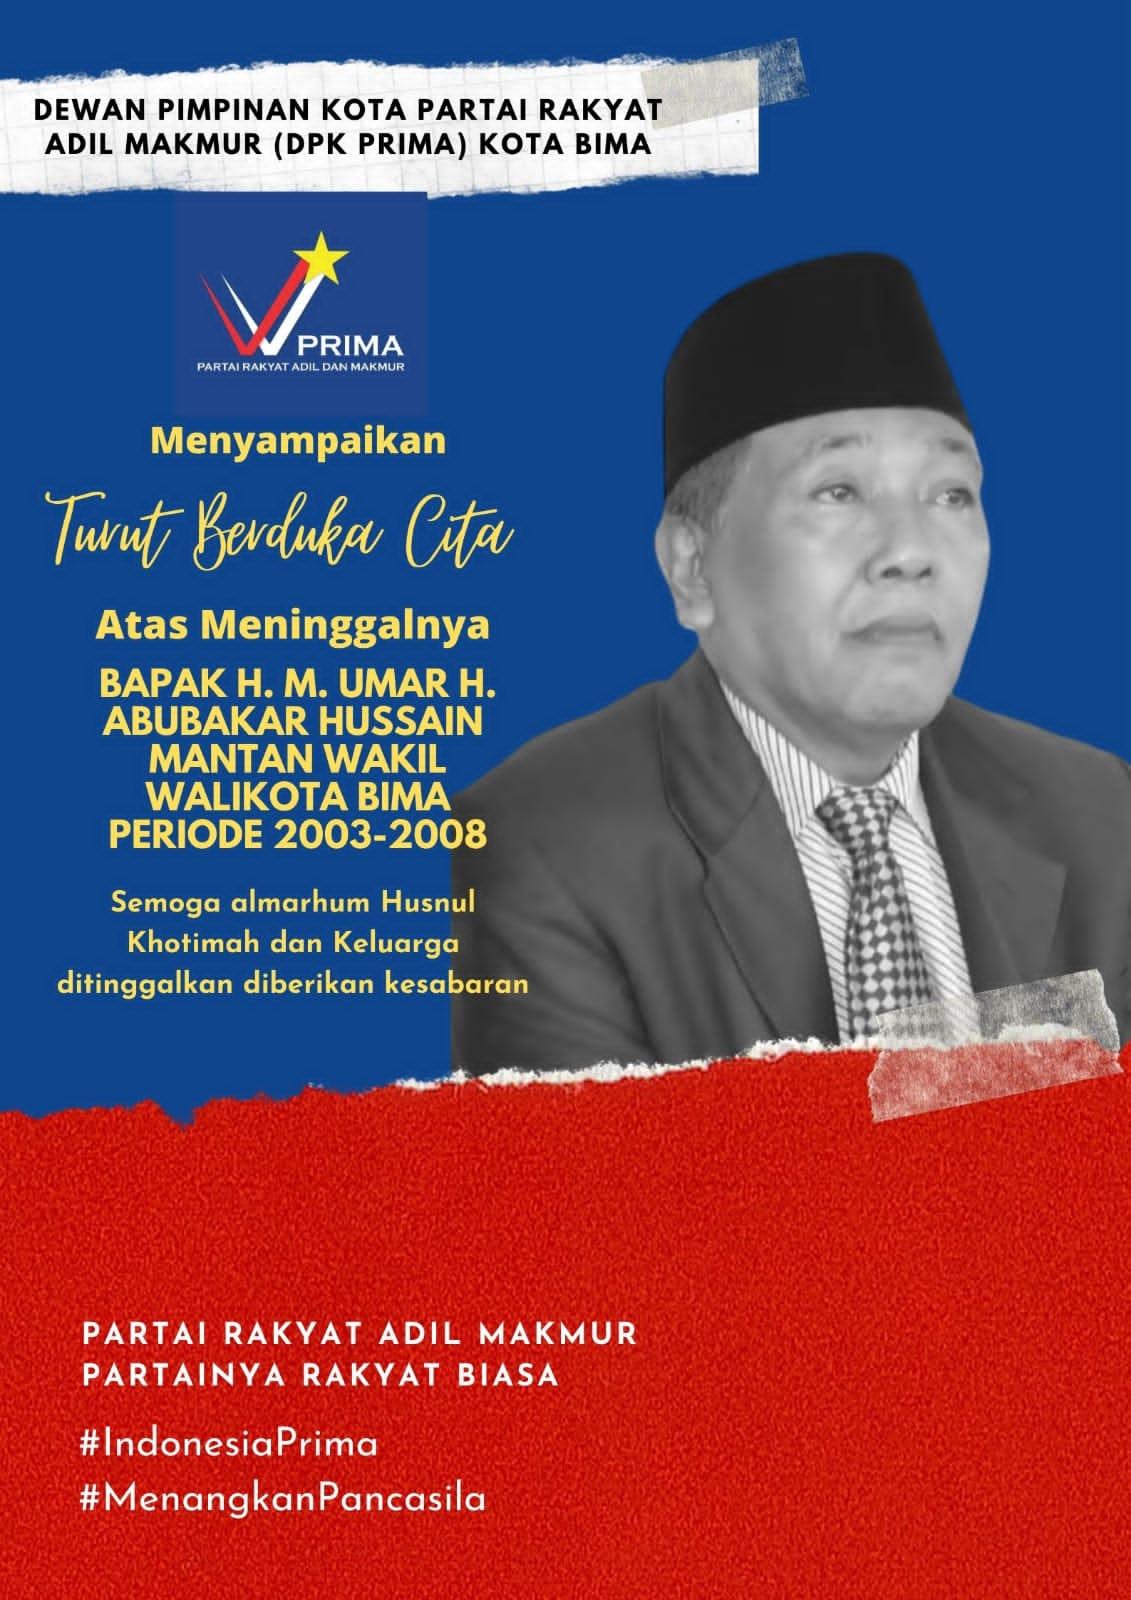 Mantan Wakil Walikota Bima Tutup Usia, Pimpinan Prima Kota BimaTurut Berduka Cita